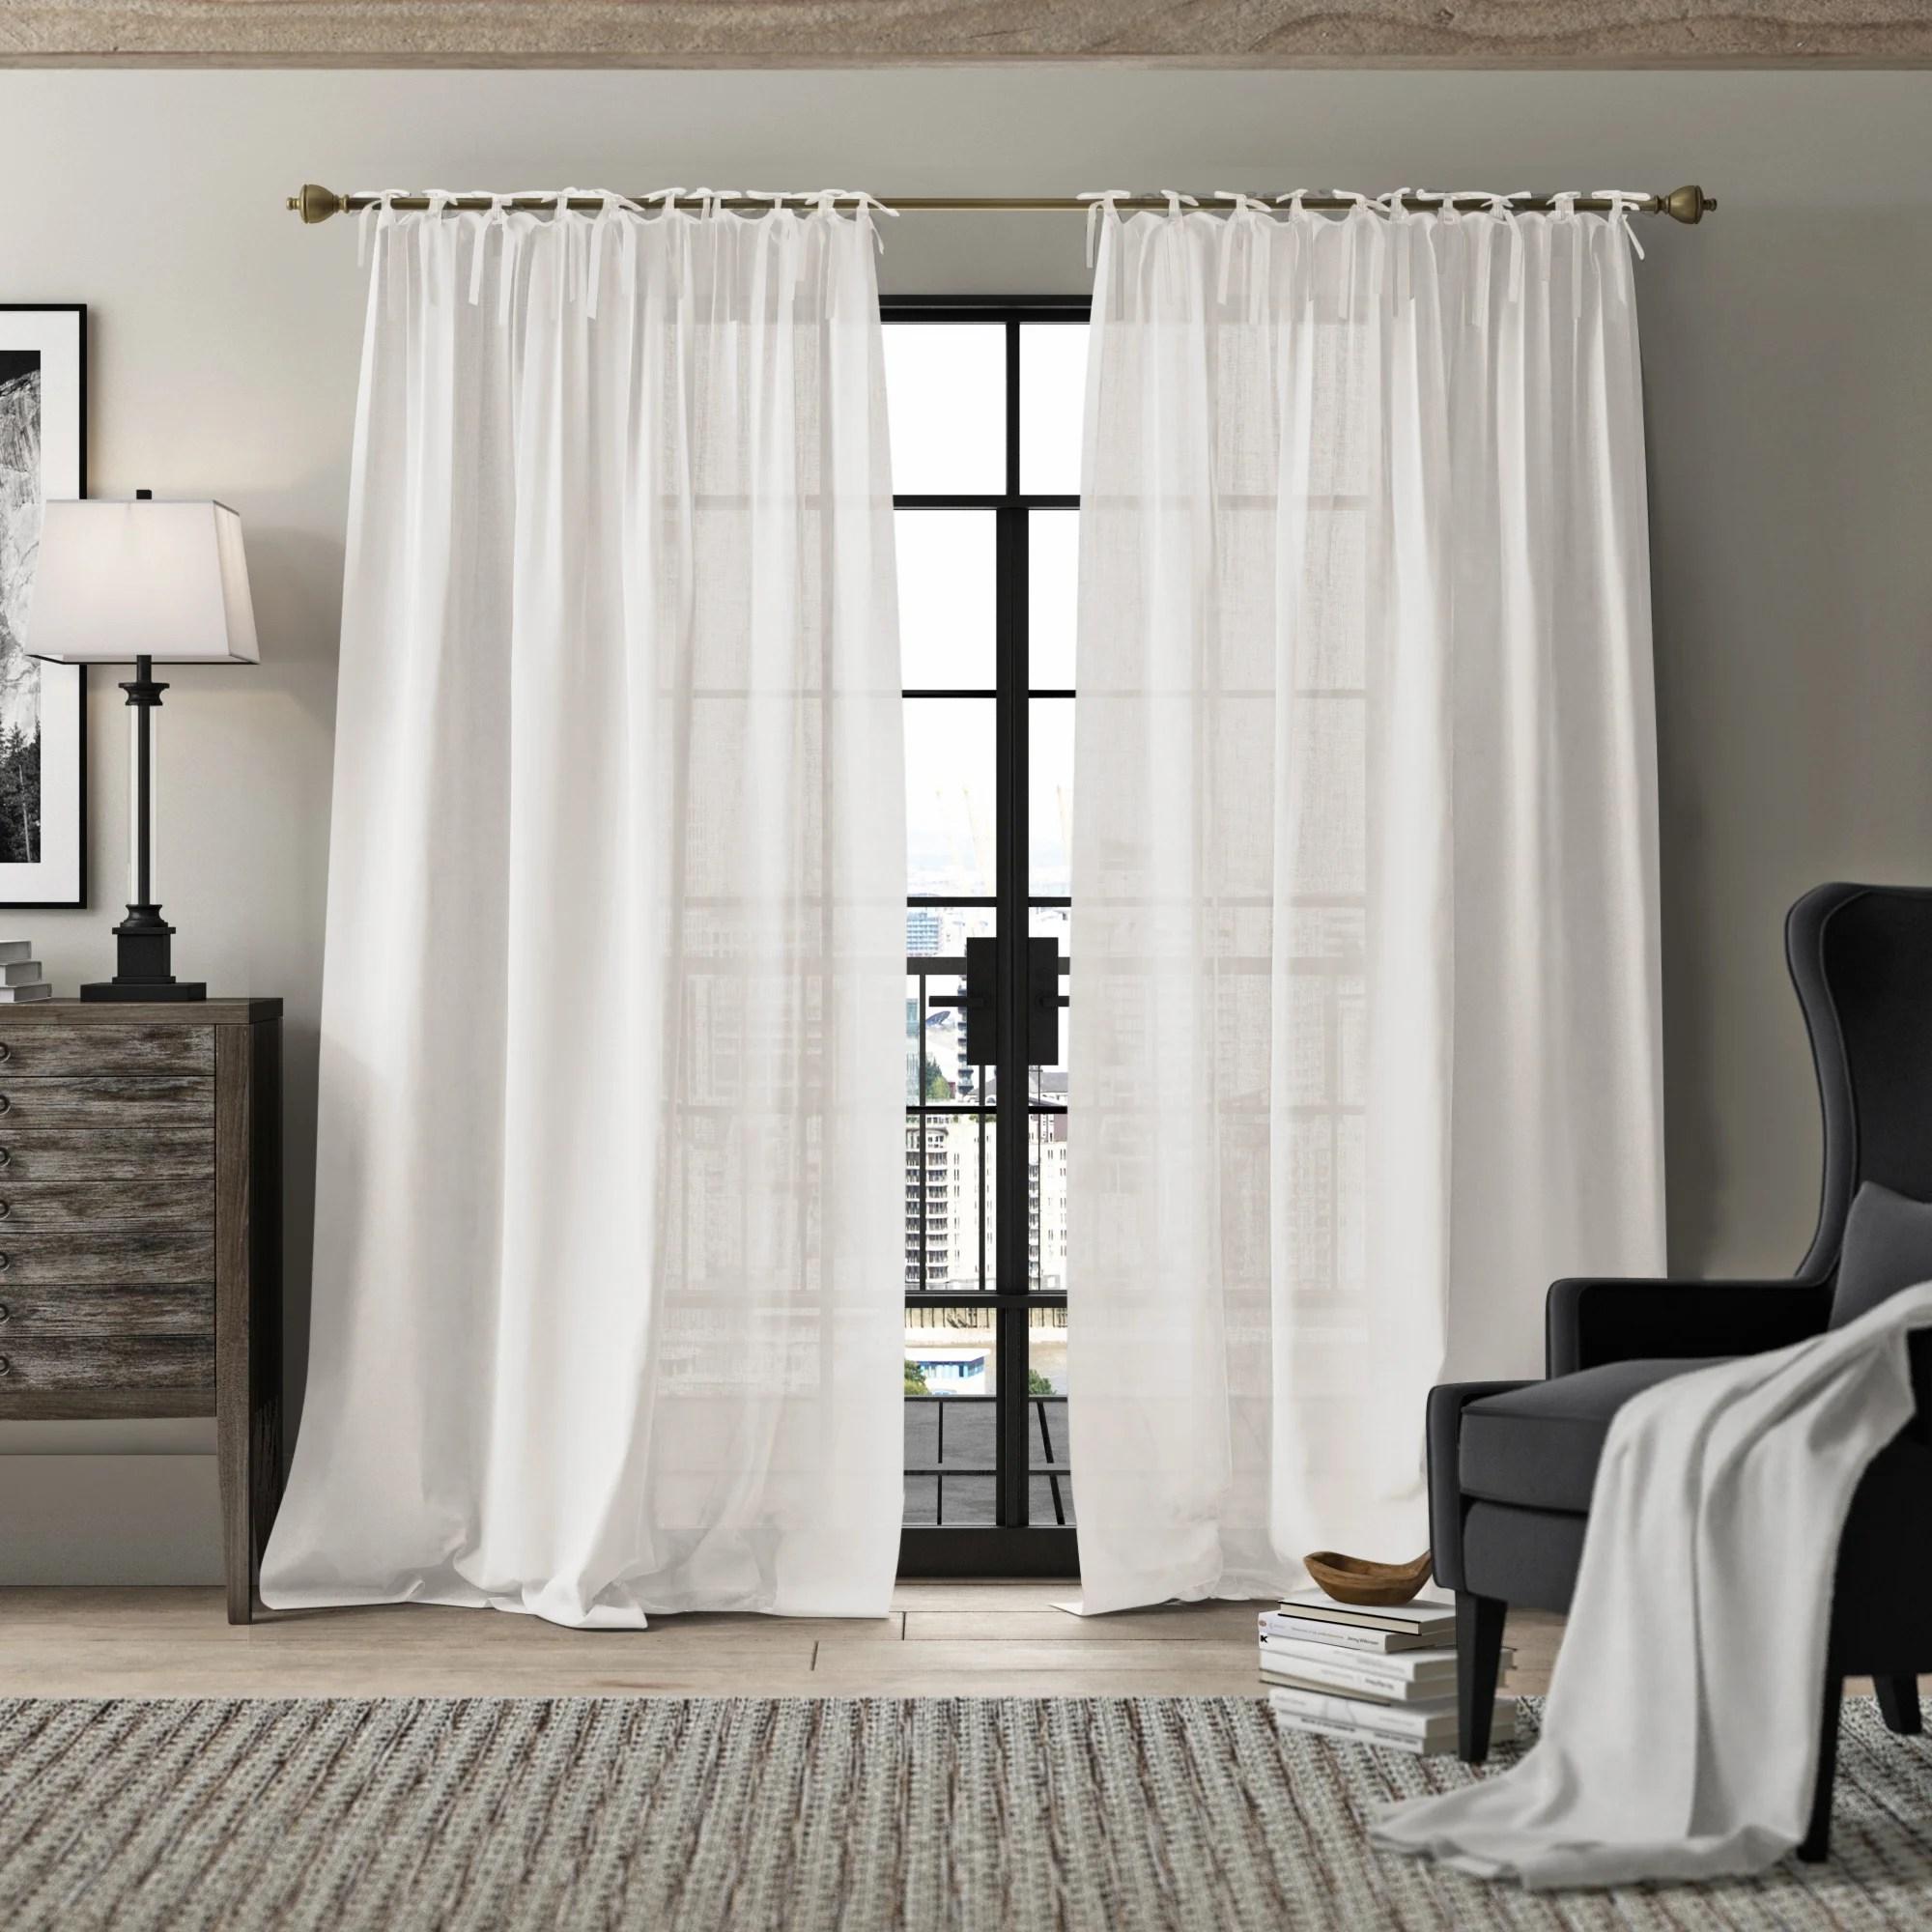 dungannon belgian flax linen tie top pinch pleat solid semi sheer tab top single curtain panel